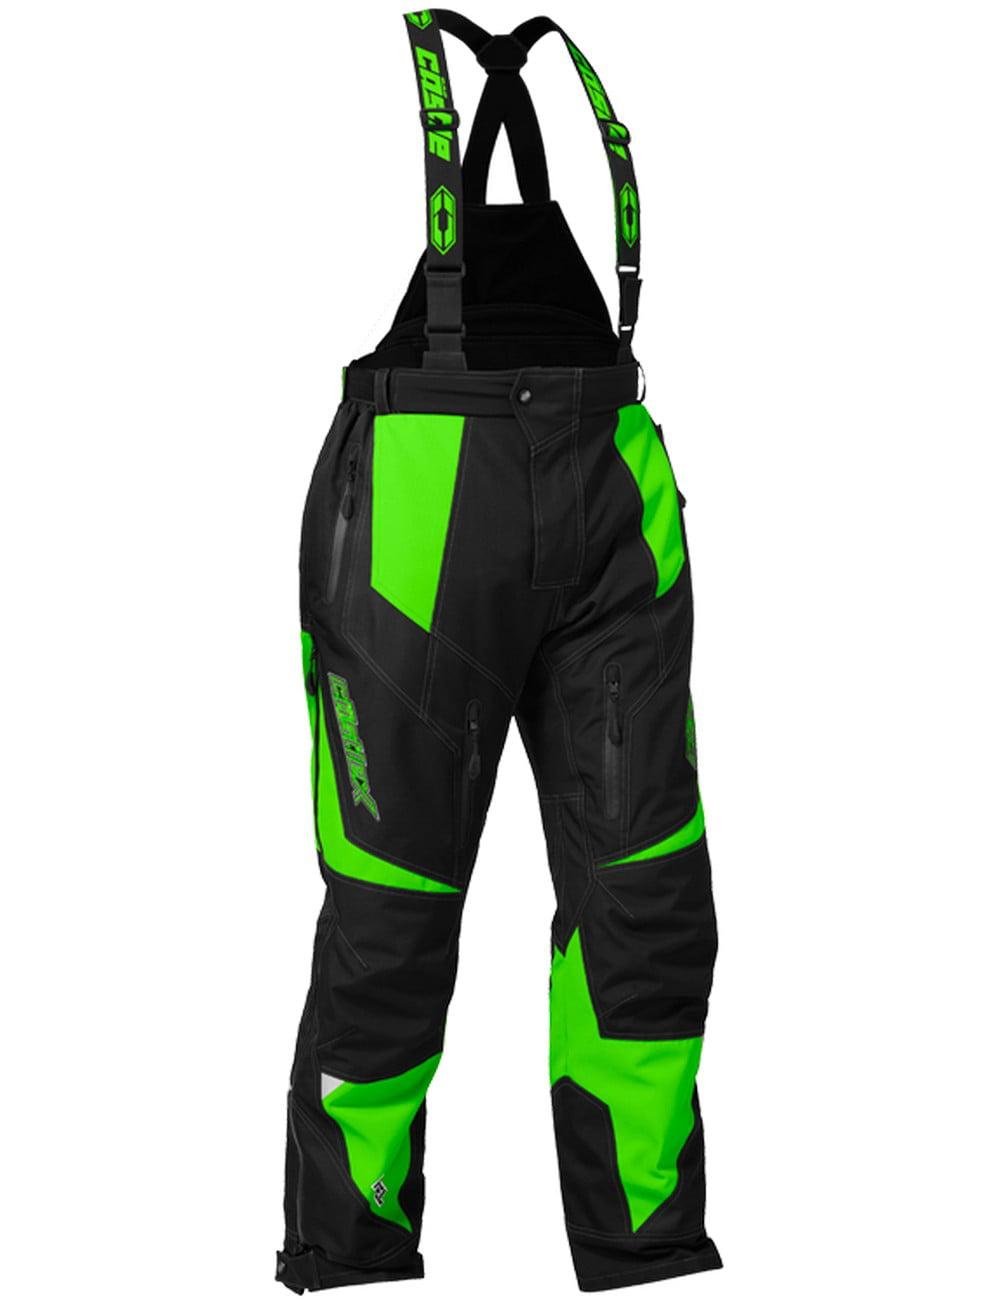 Castle X Fuel G6 Mens Snowmobile Bibs Green by